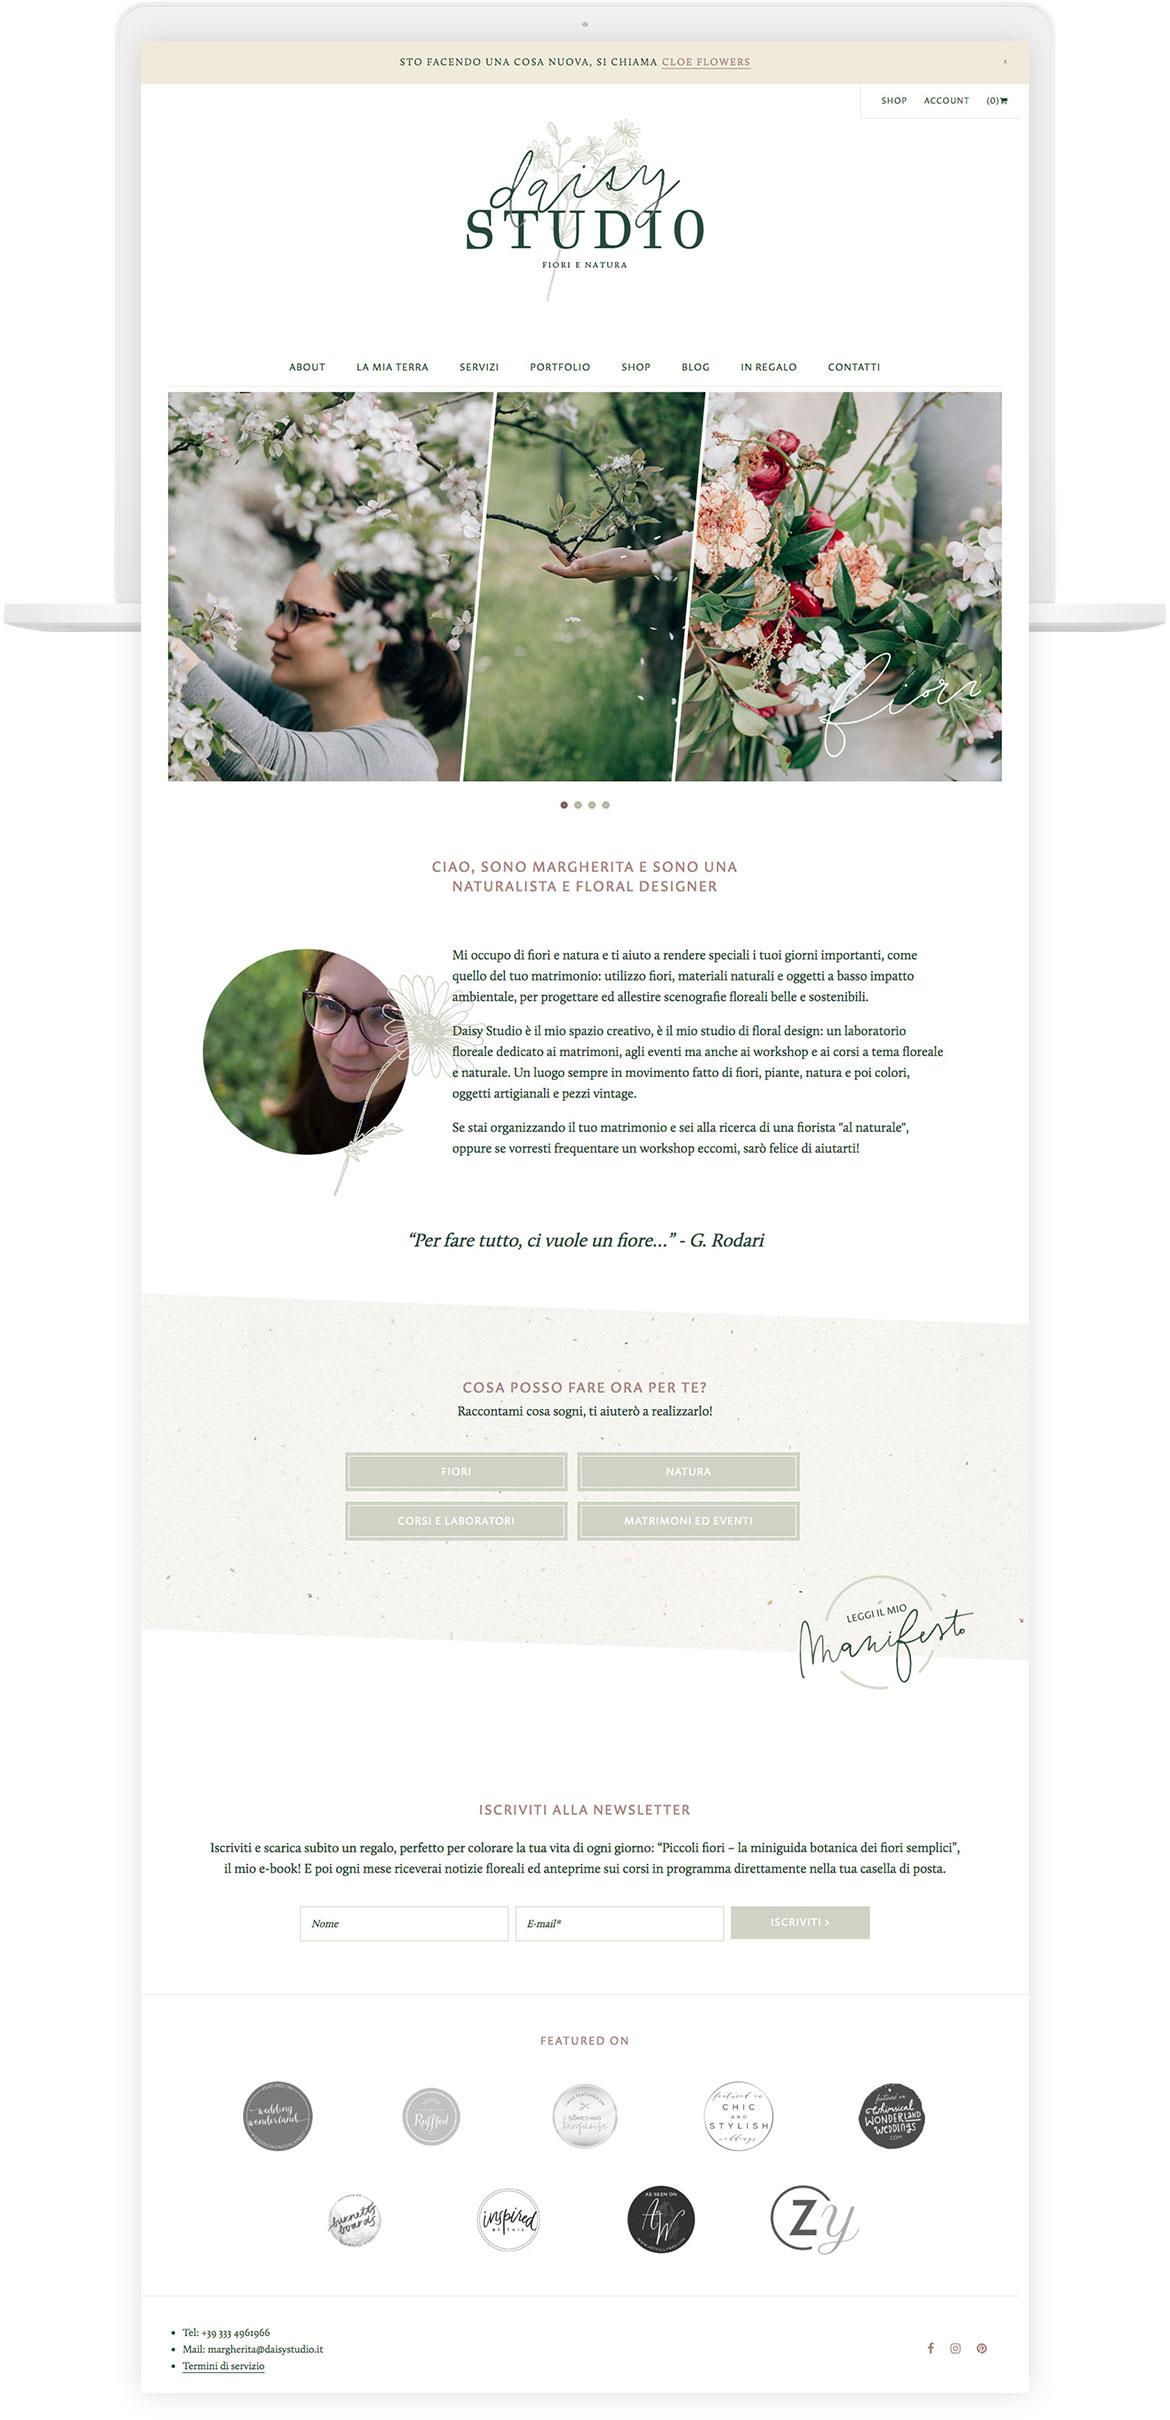 Miel Café Design Portfolio: Floral romantic web design for floral designer Daisy Studio